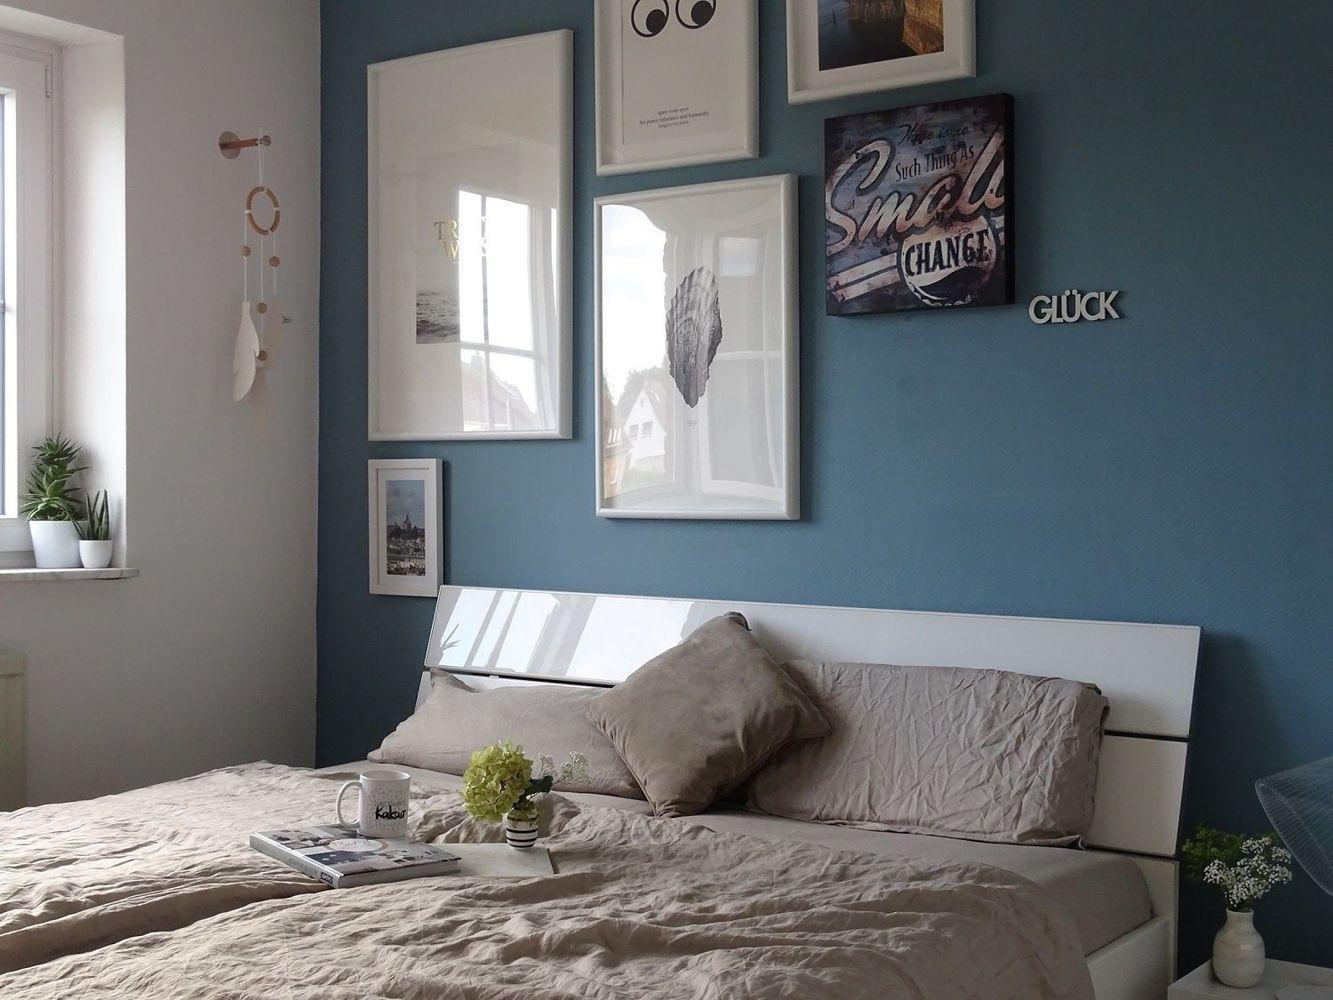 Schlafzimmer Wandfarbe Grau Grün